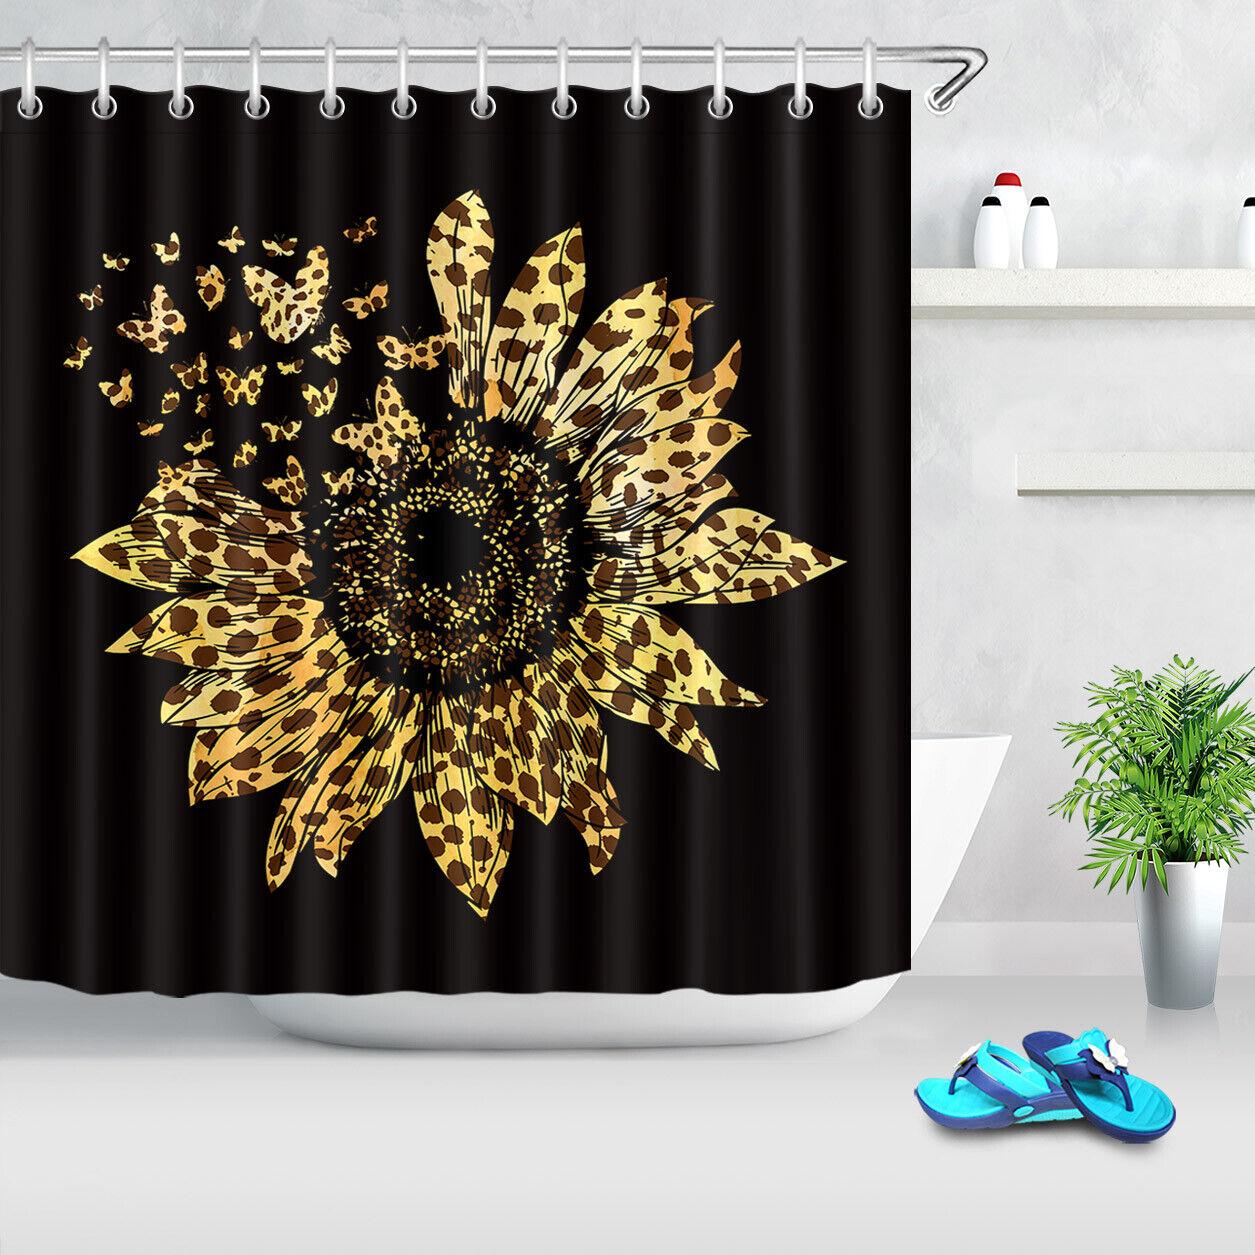 leopard dots spots sunflower butterfly black shower curtain set bathroom decor